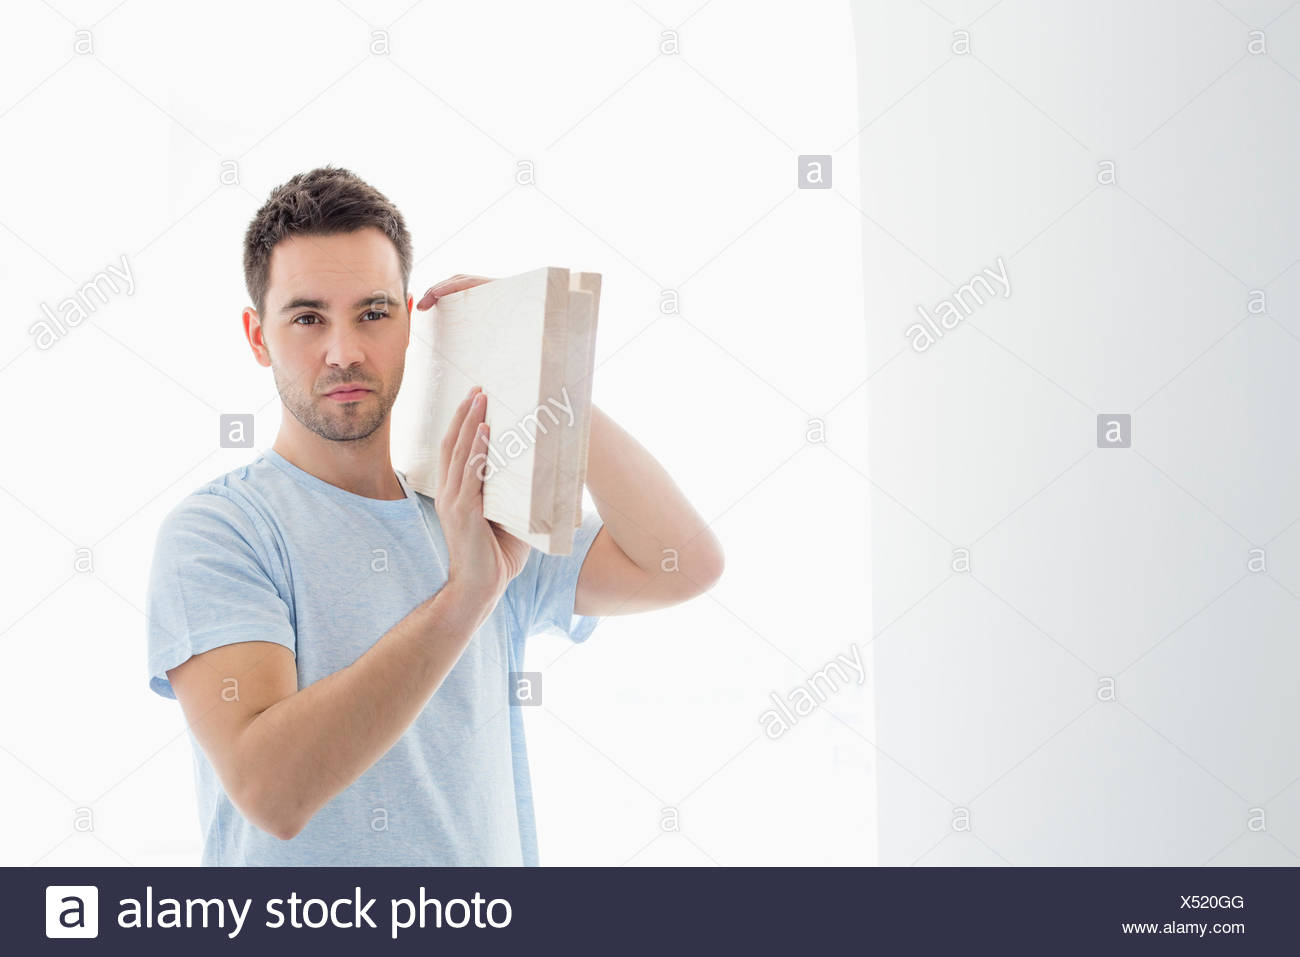 Mid-Adult Mann mit Bauholz auf Schulter Stockbild